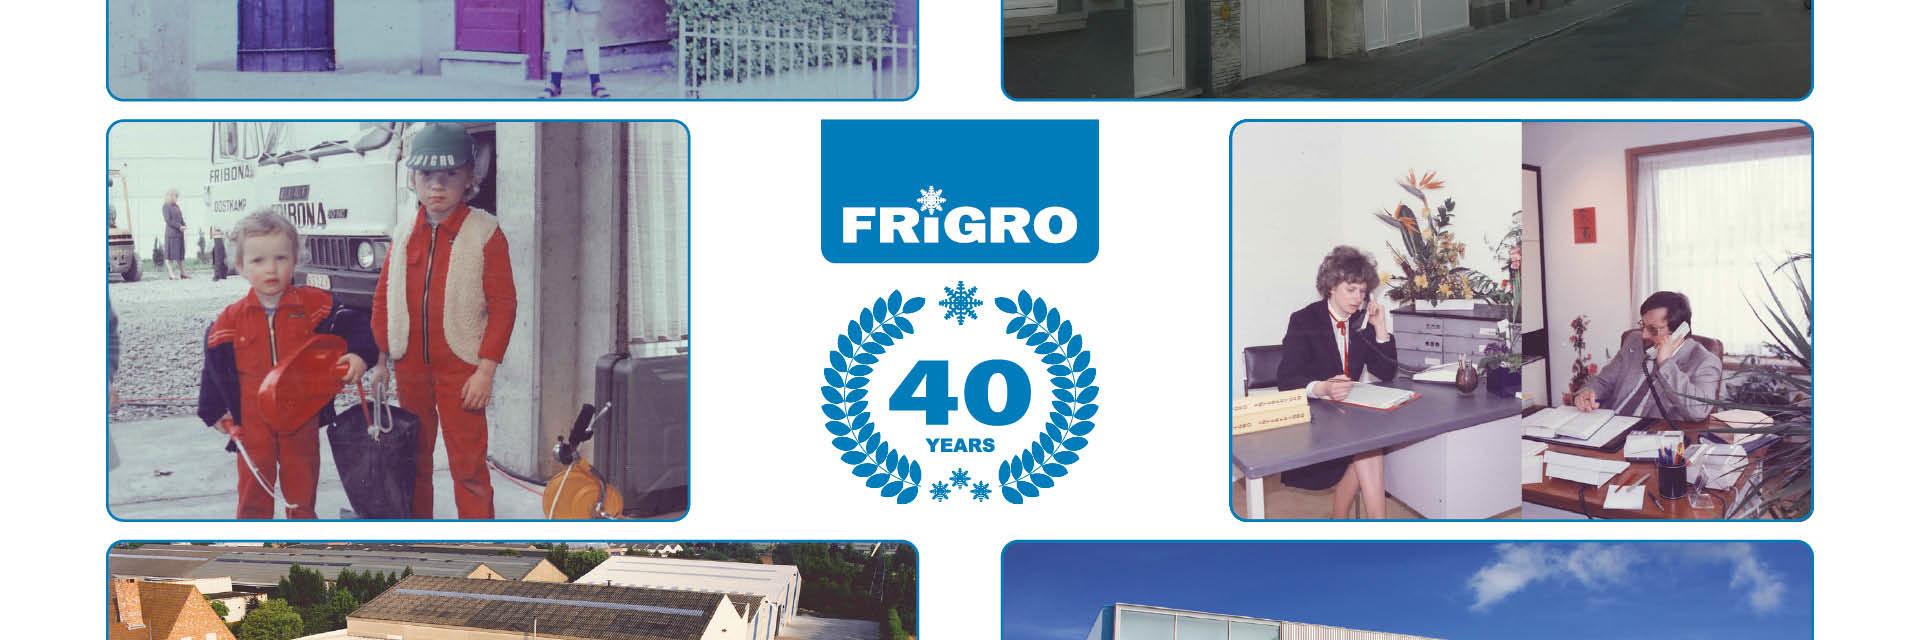 Frigro 40